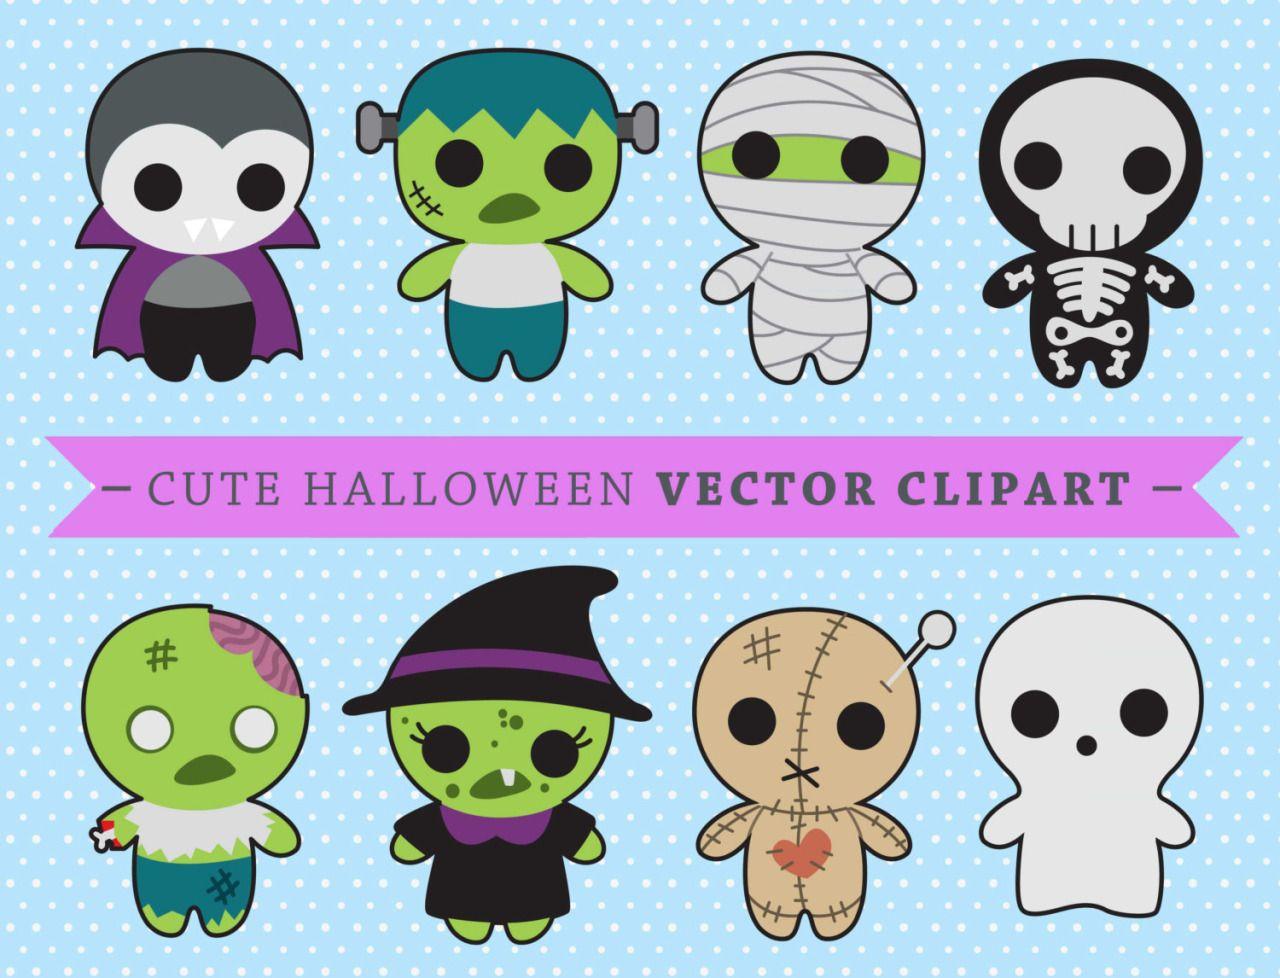 hight resolution of premium vector clipart kawaii spooky halloween halloween monsters clipart high quality vectors instant download kawaii clipart